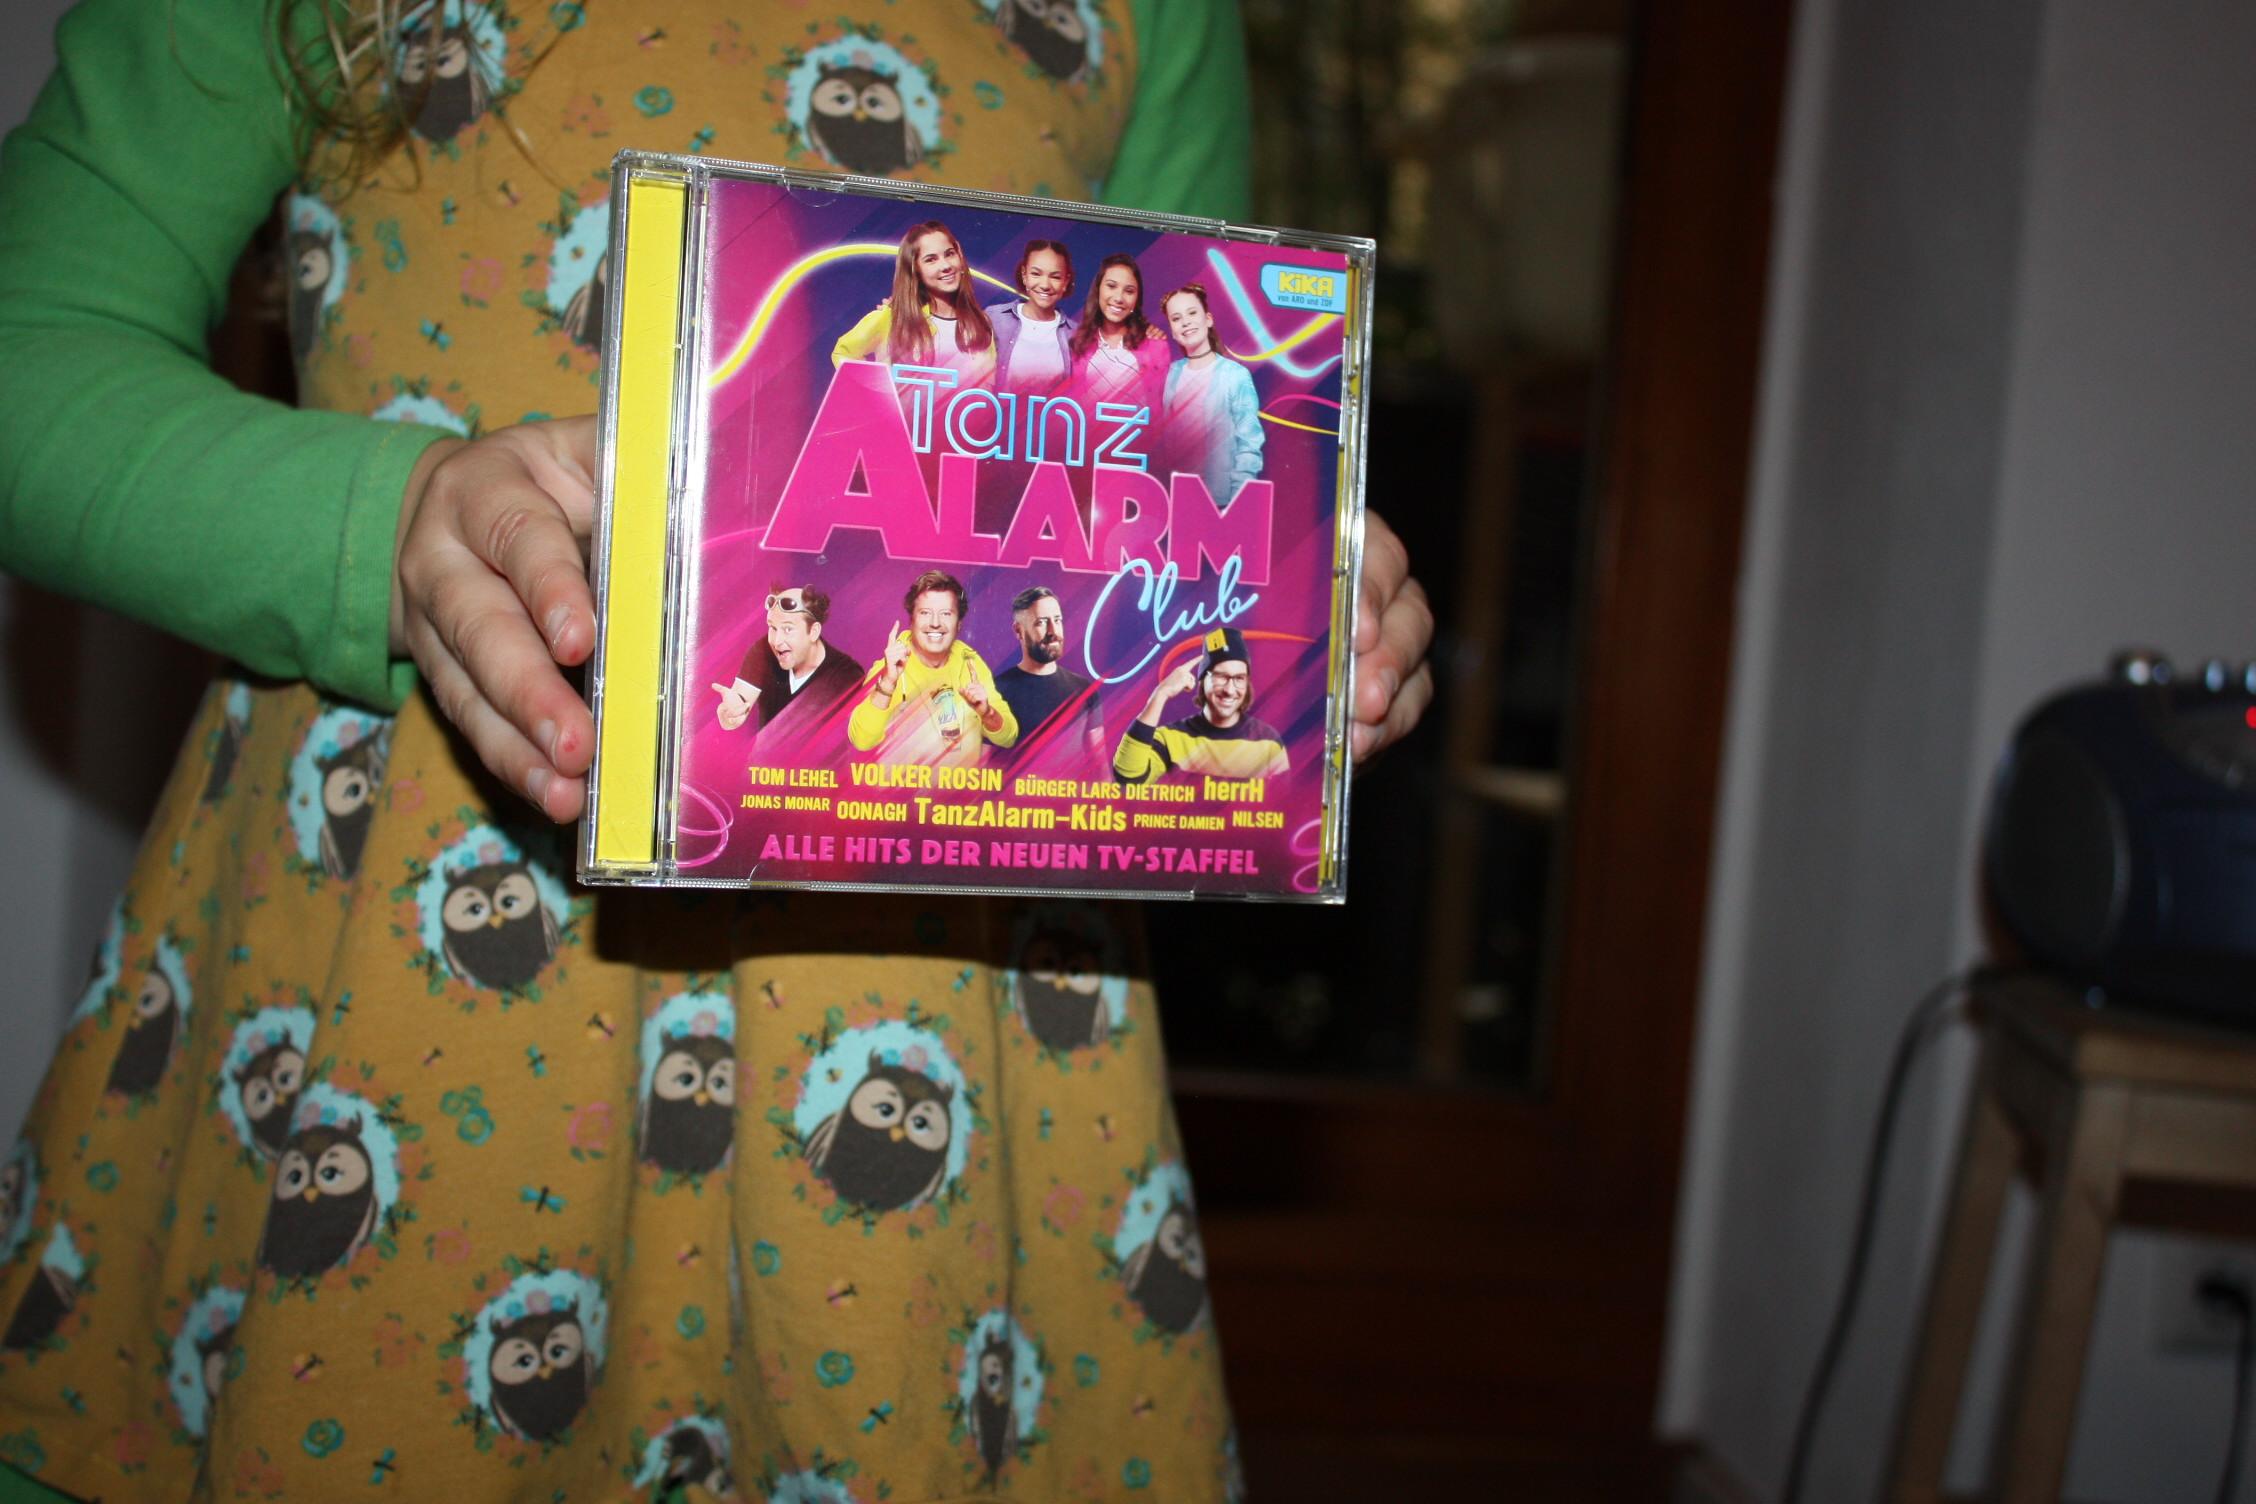 KiKa Tanzalarm CD